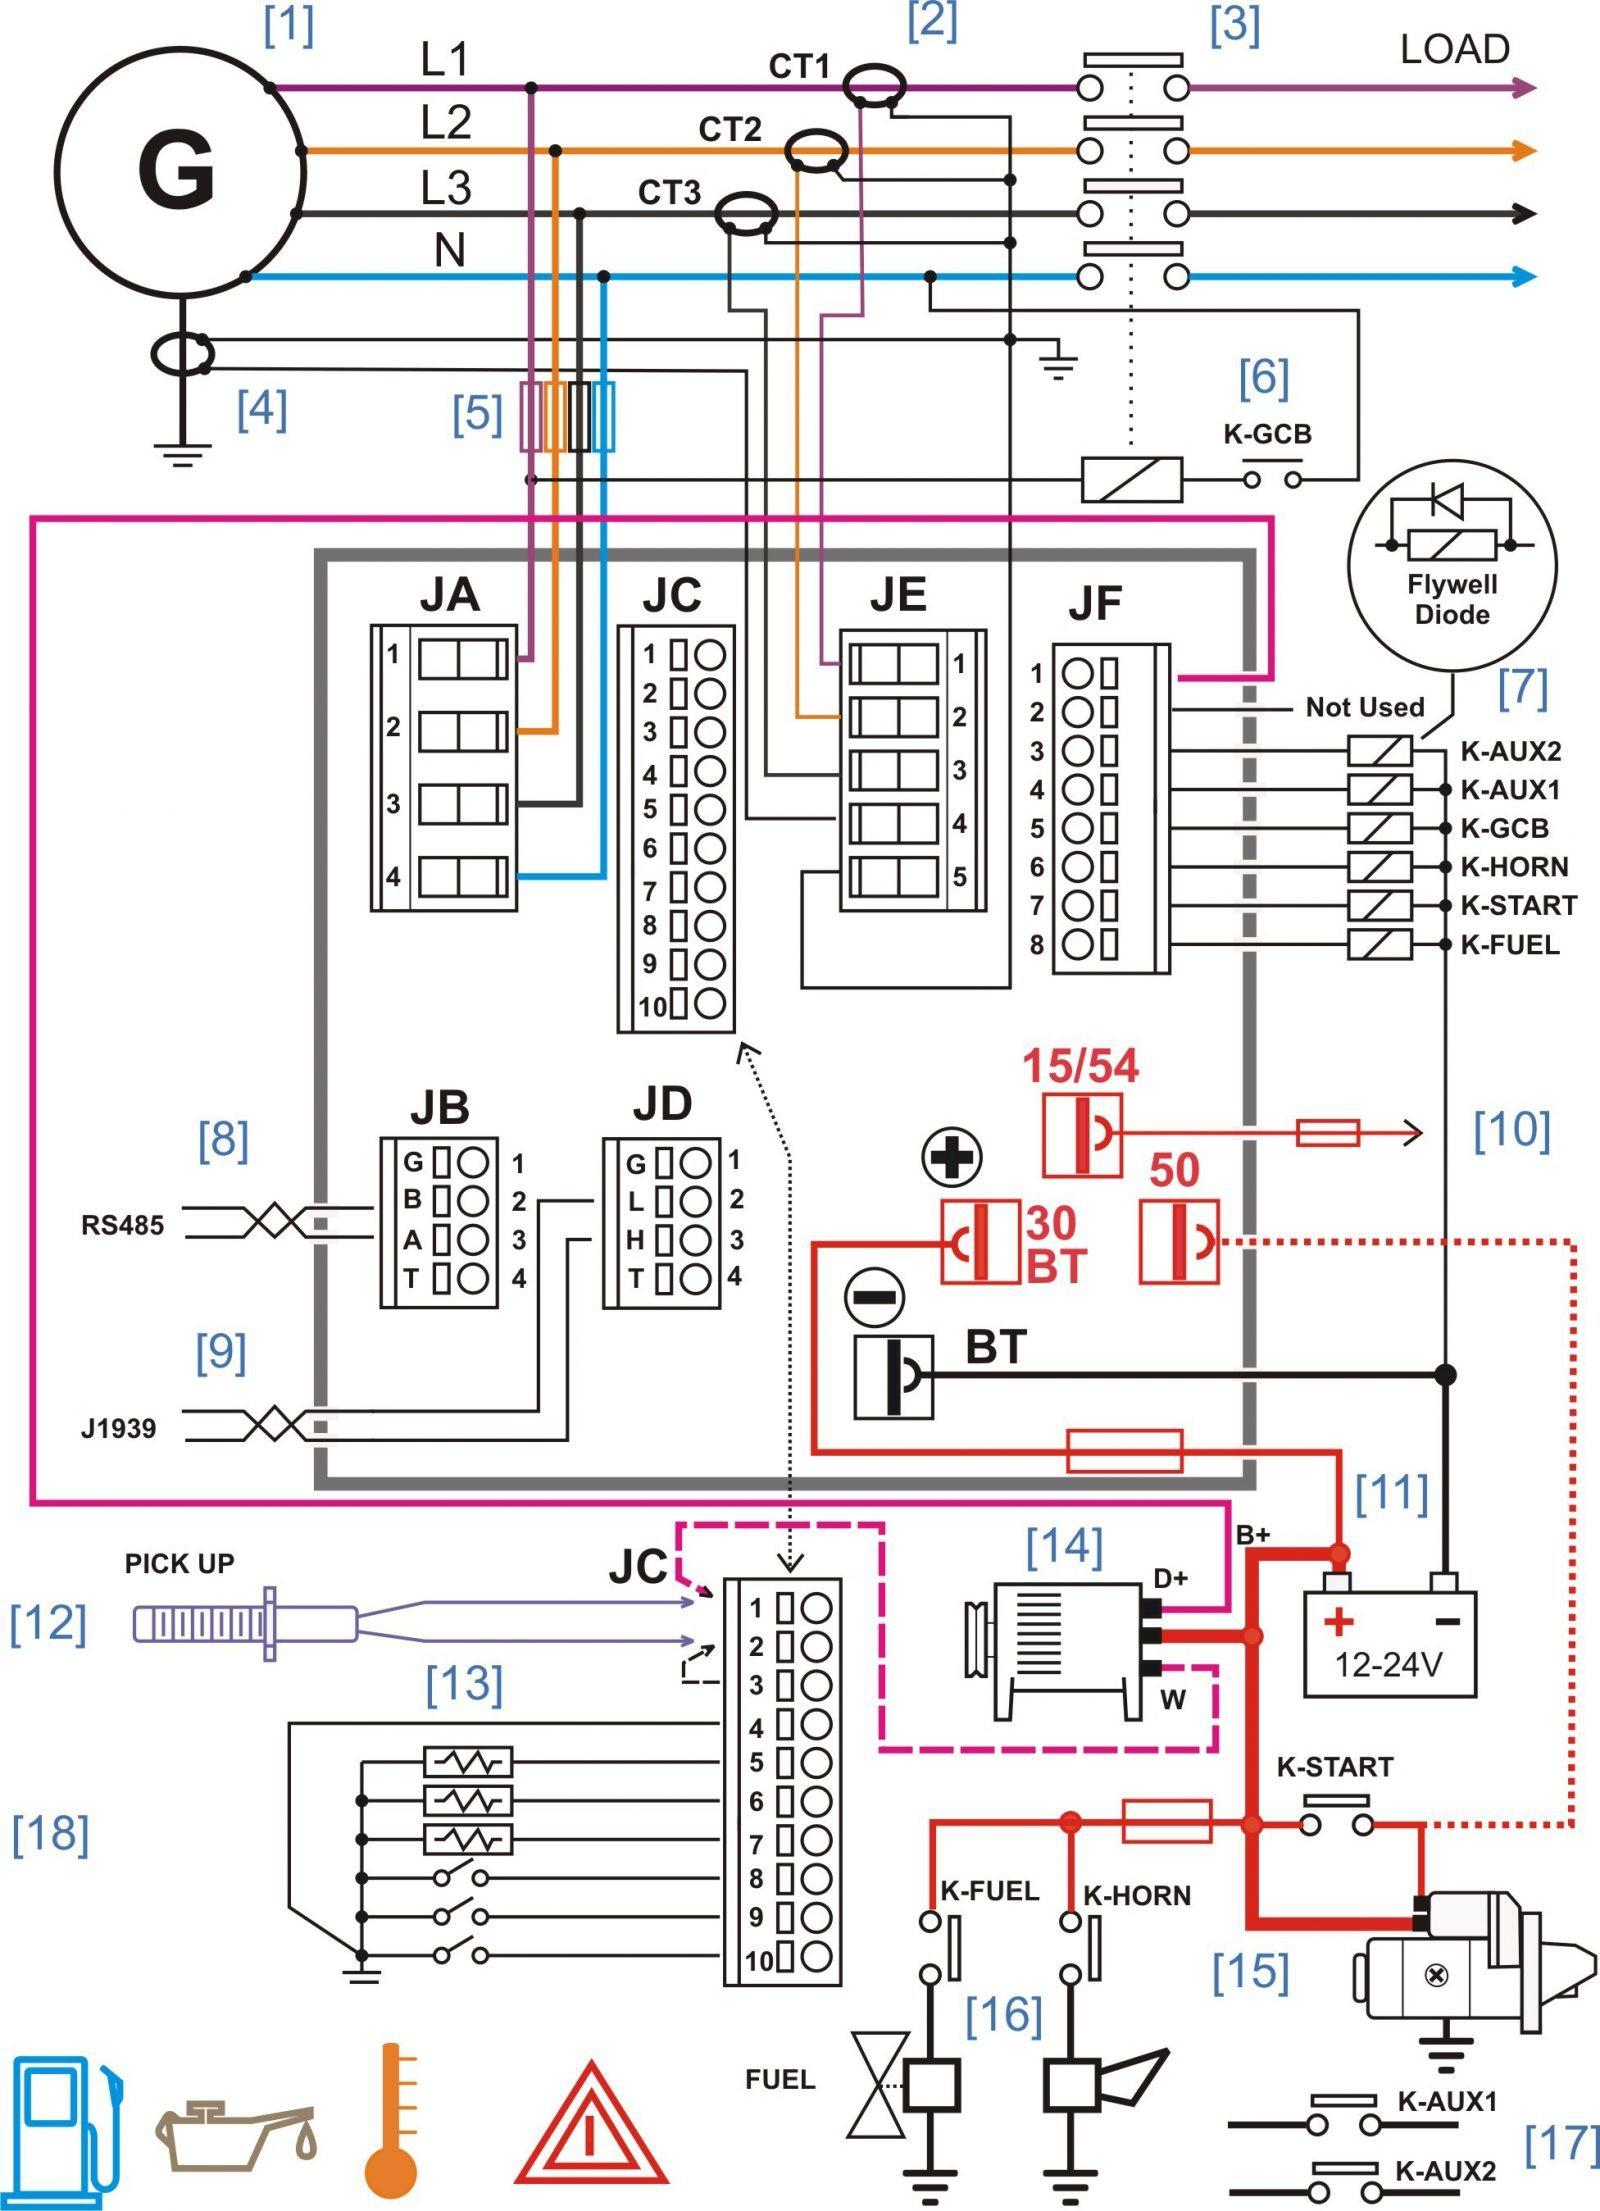 Wiring Diagram for A Jvc Car Stereo Lovely Car Stereo Wiring Diagram Diagram Of Wiring Diagram for A Jvc Car Stereo